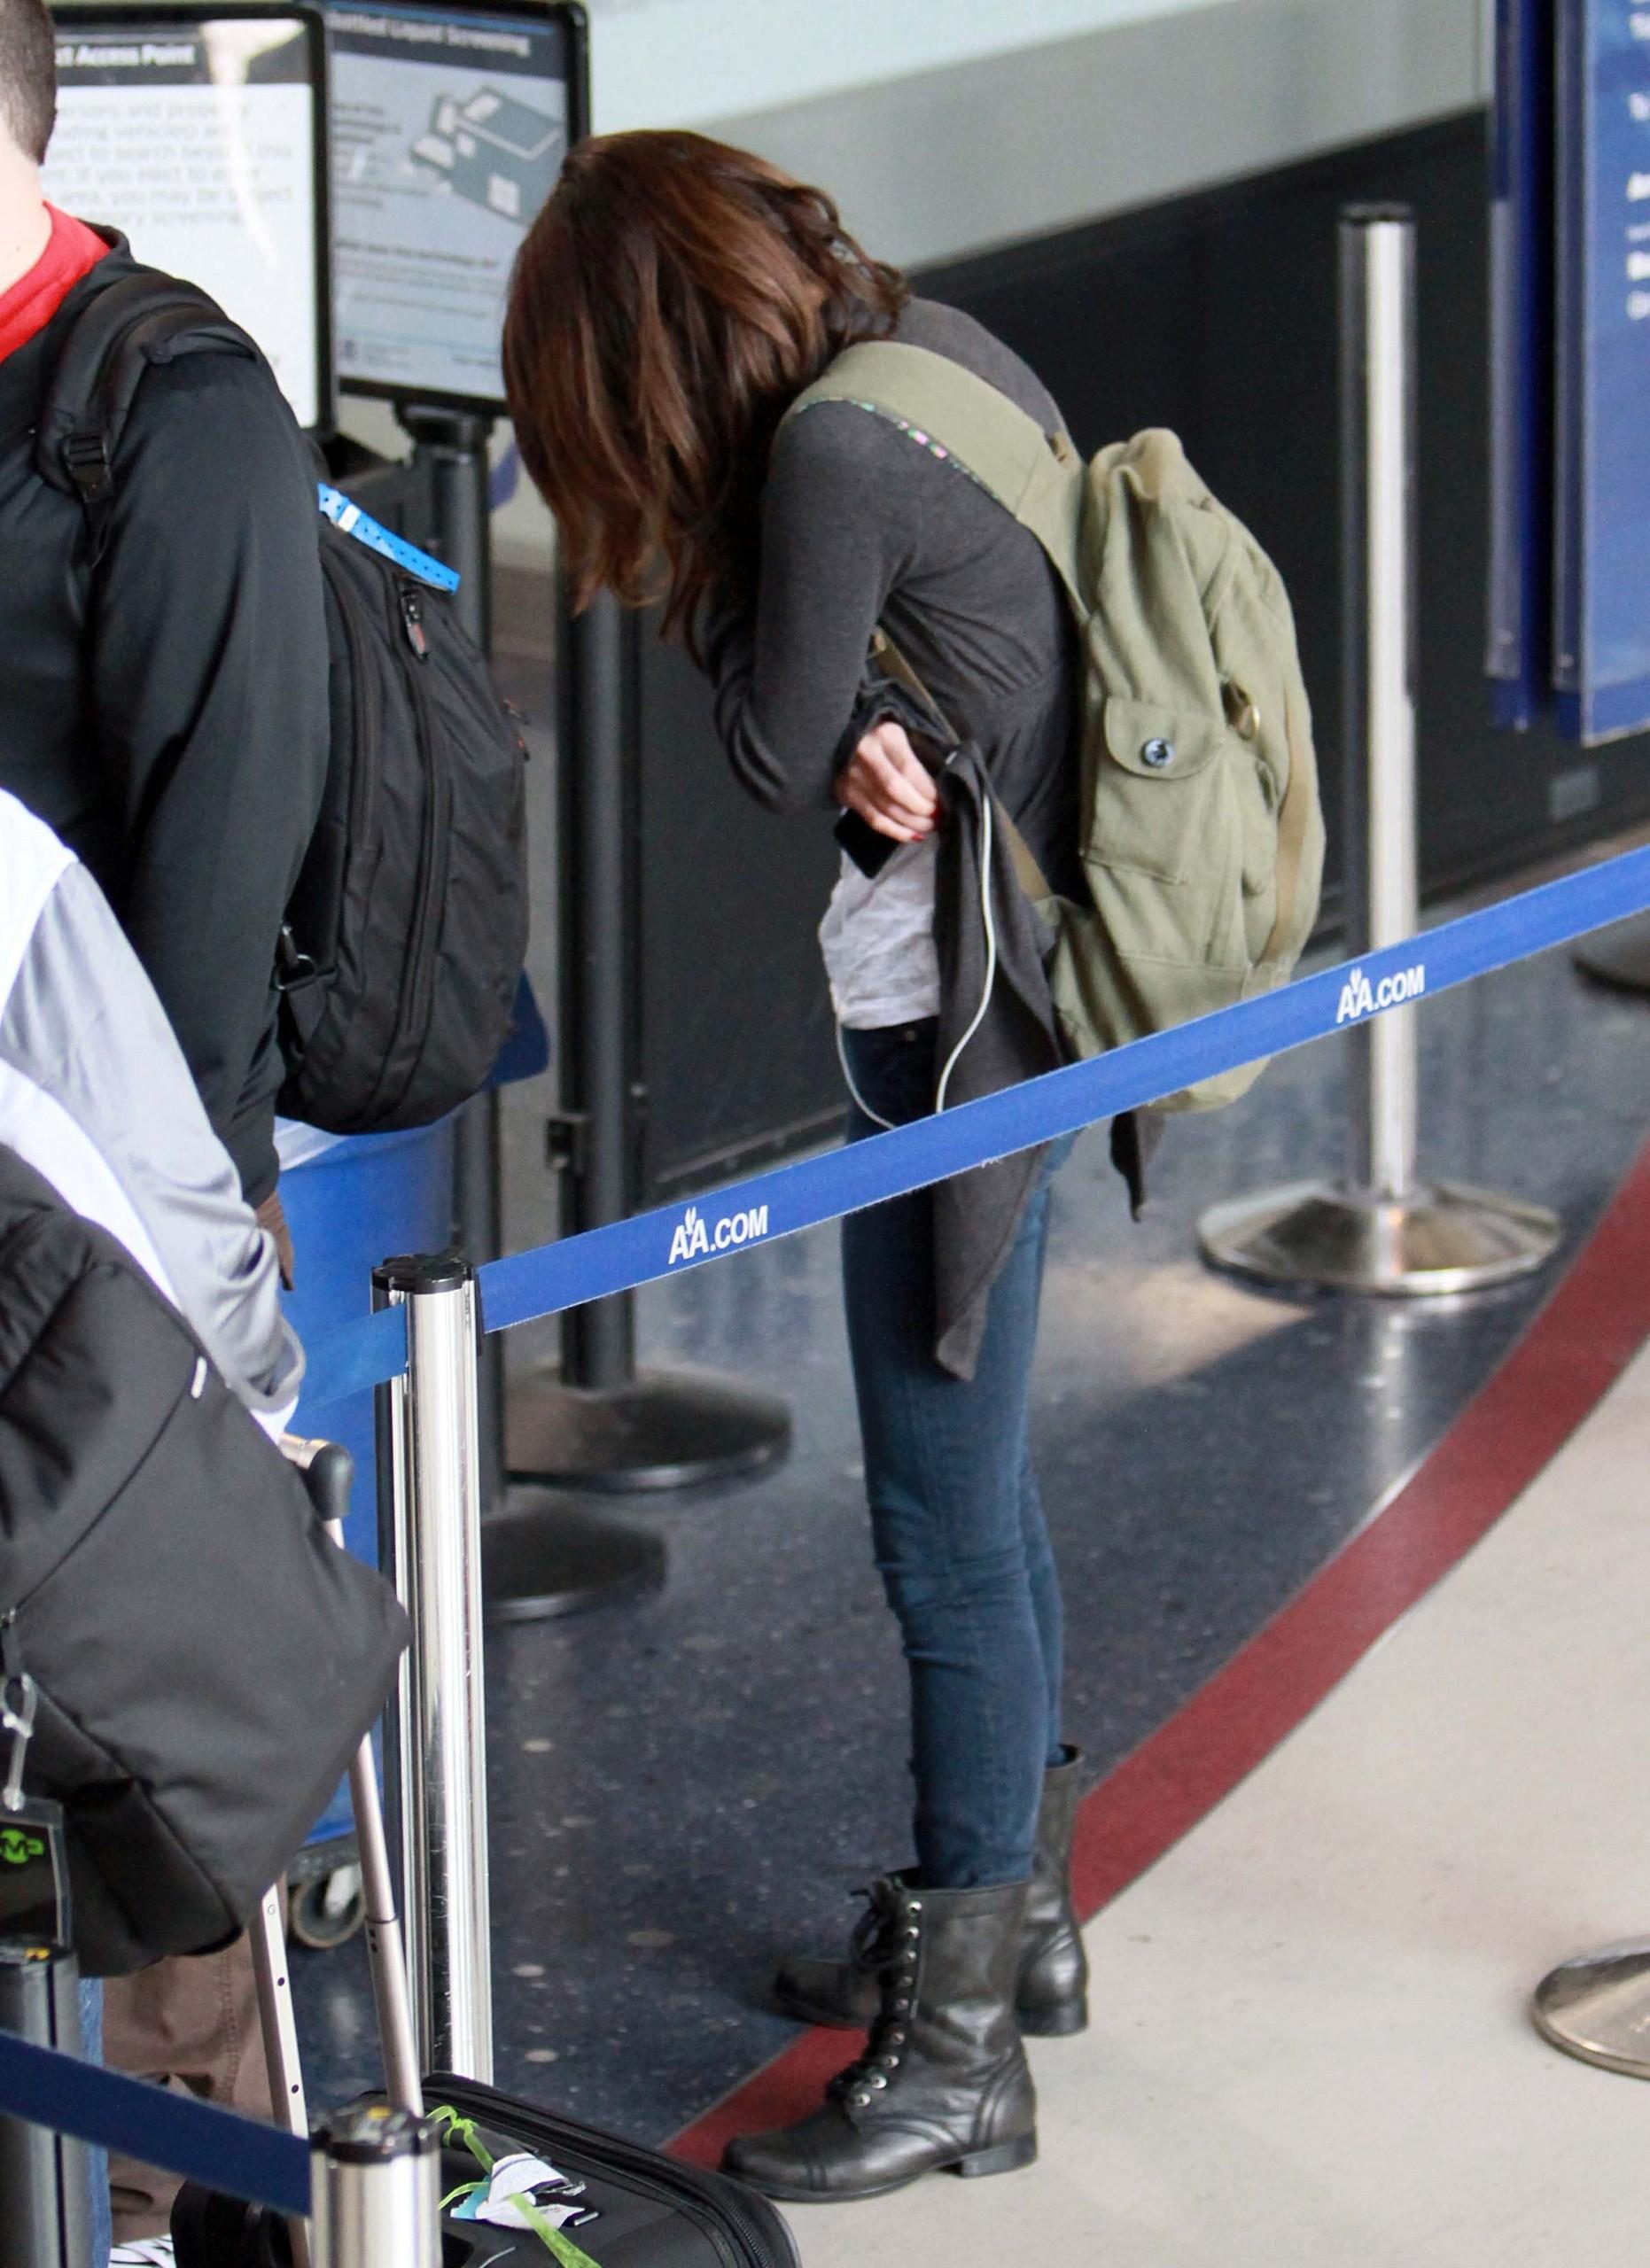 January 30 - At LAX Airport, 2011